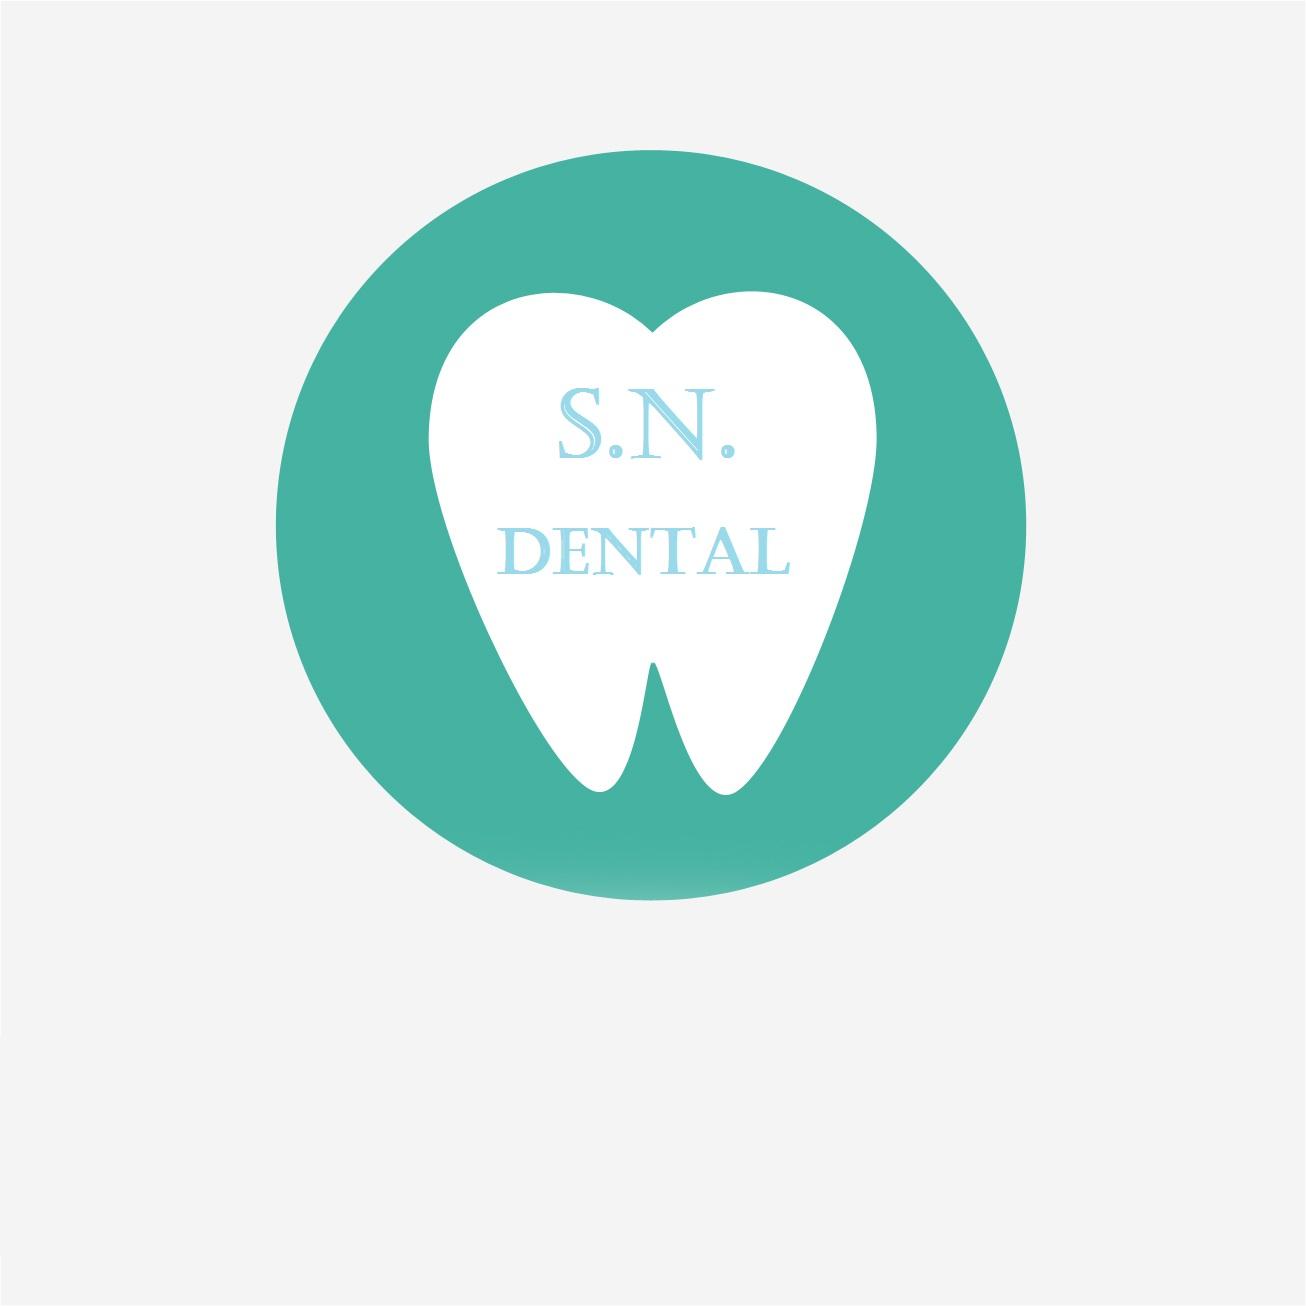 S. N. Dental Clinic